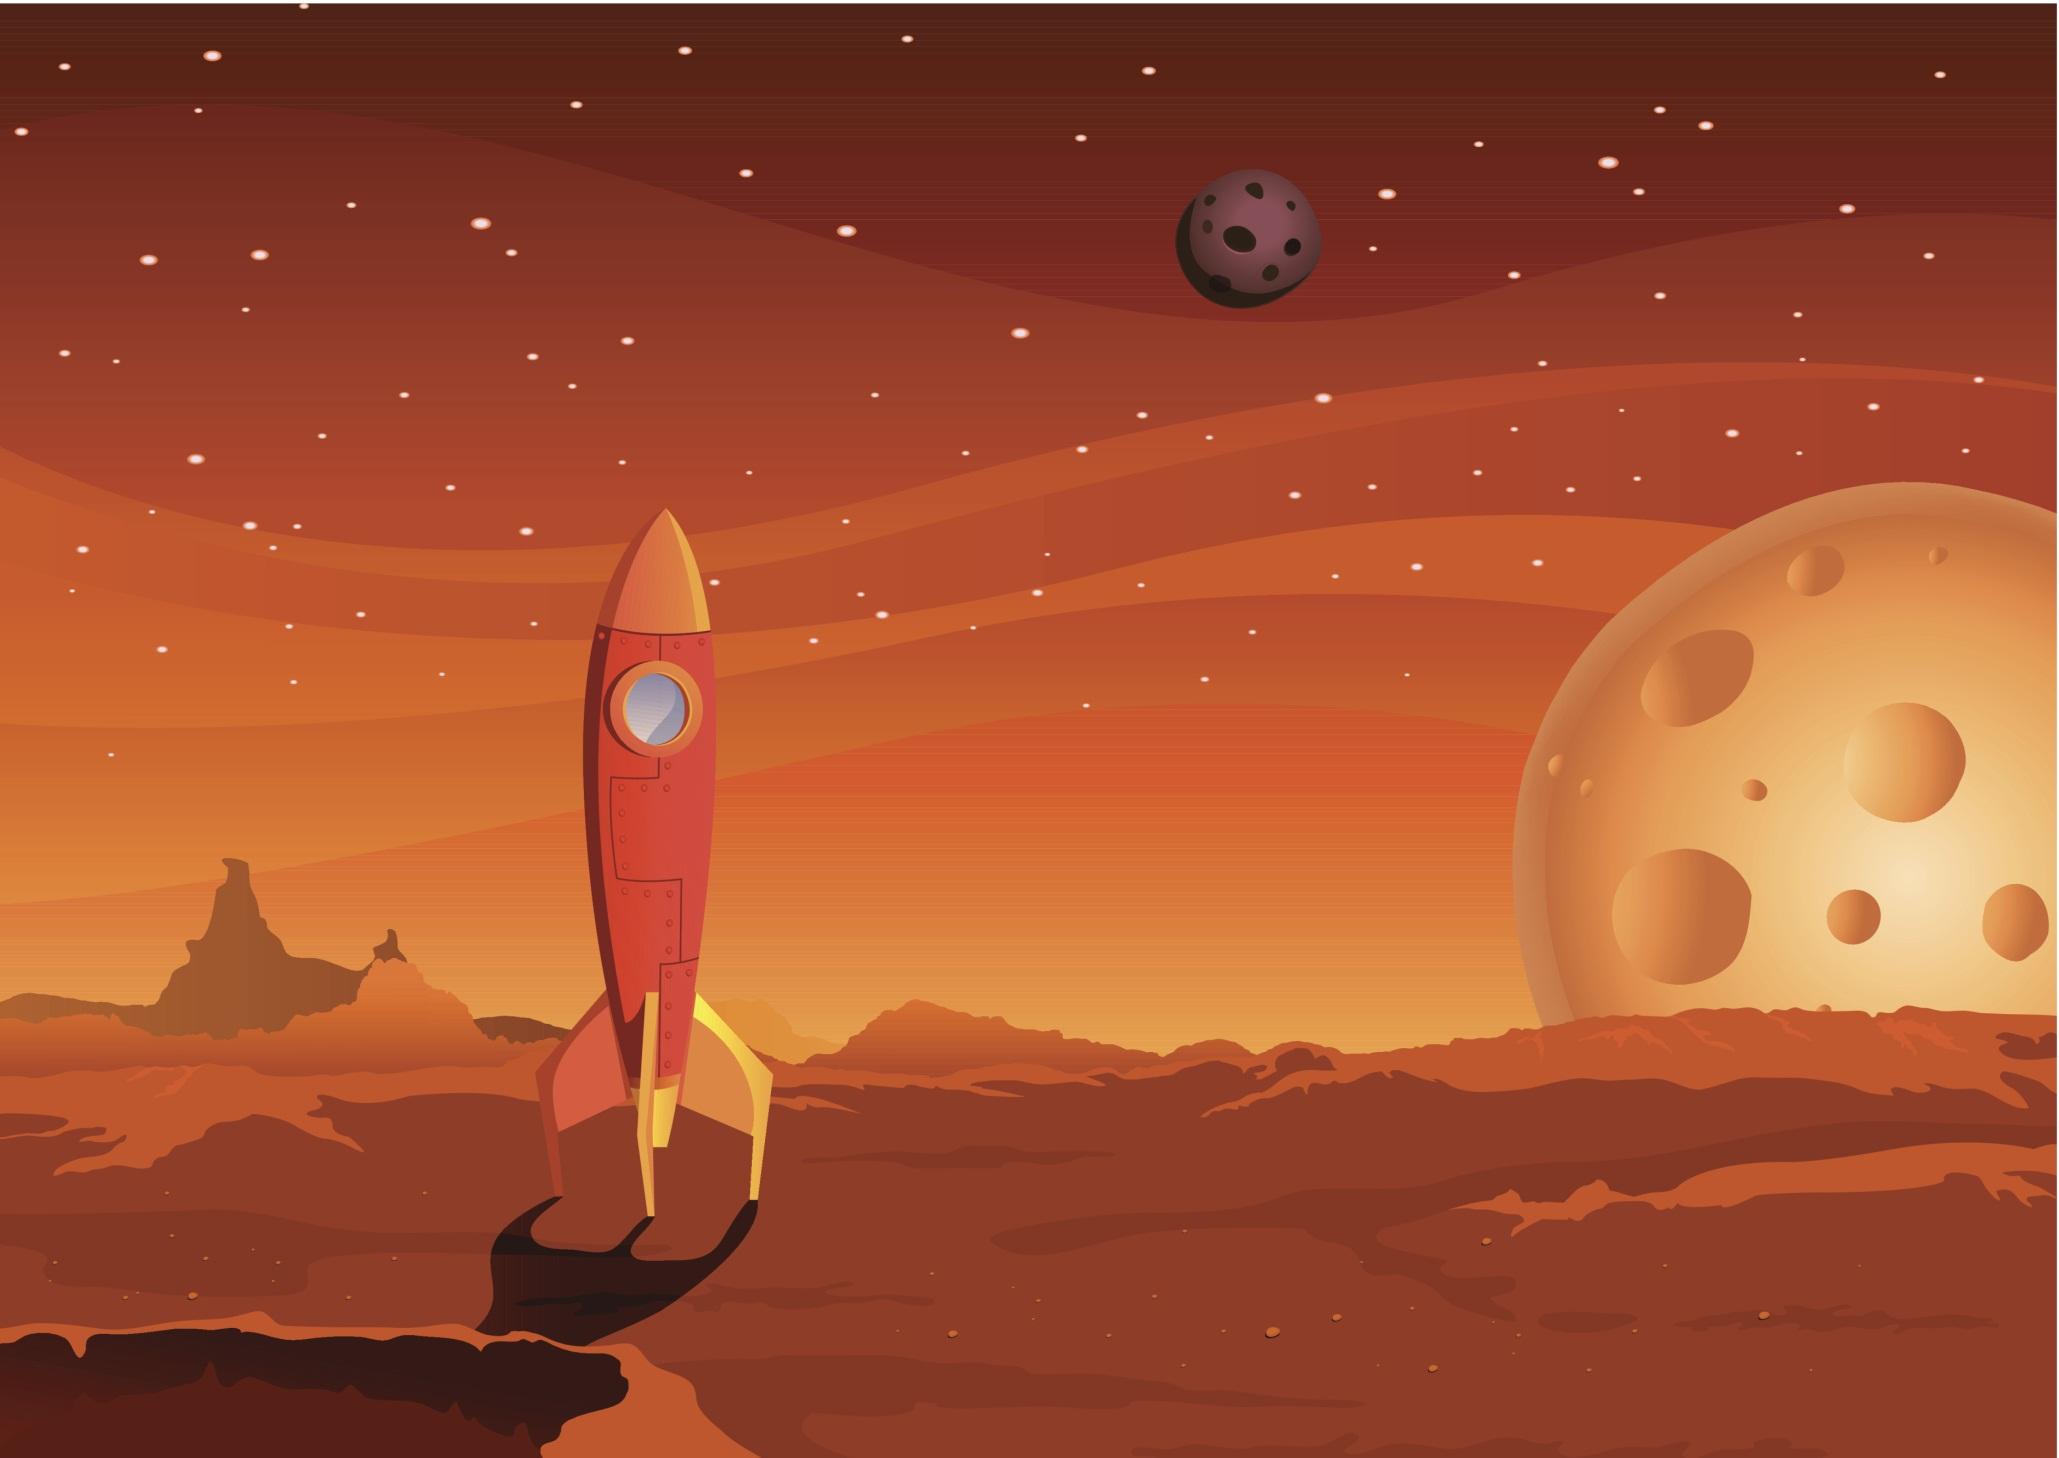 Spaceship on Martian landscape